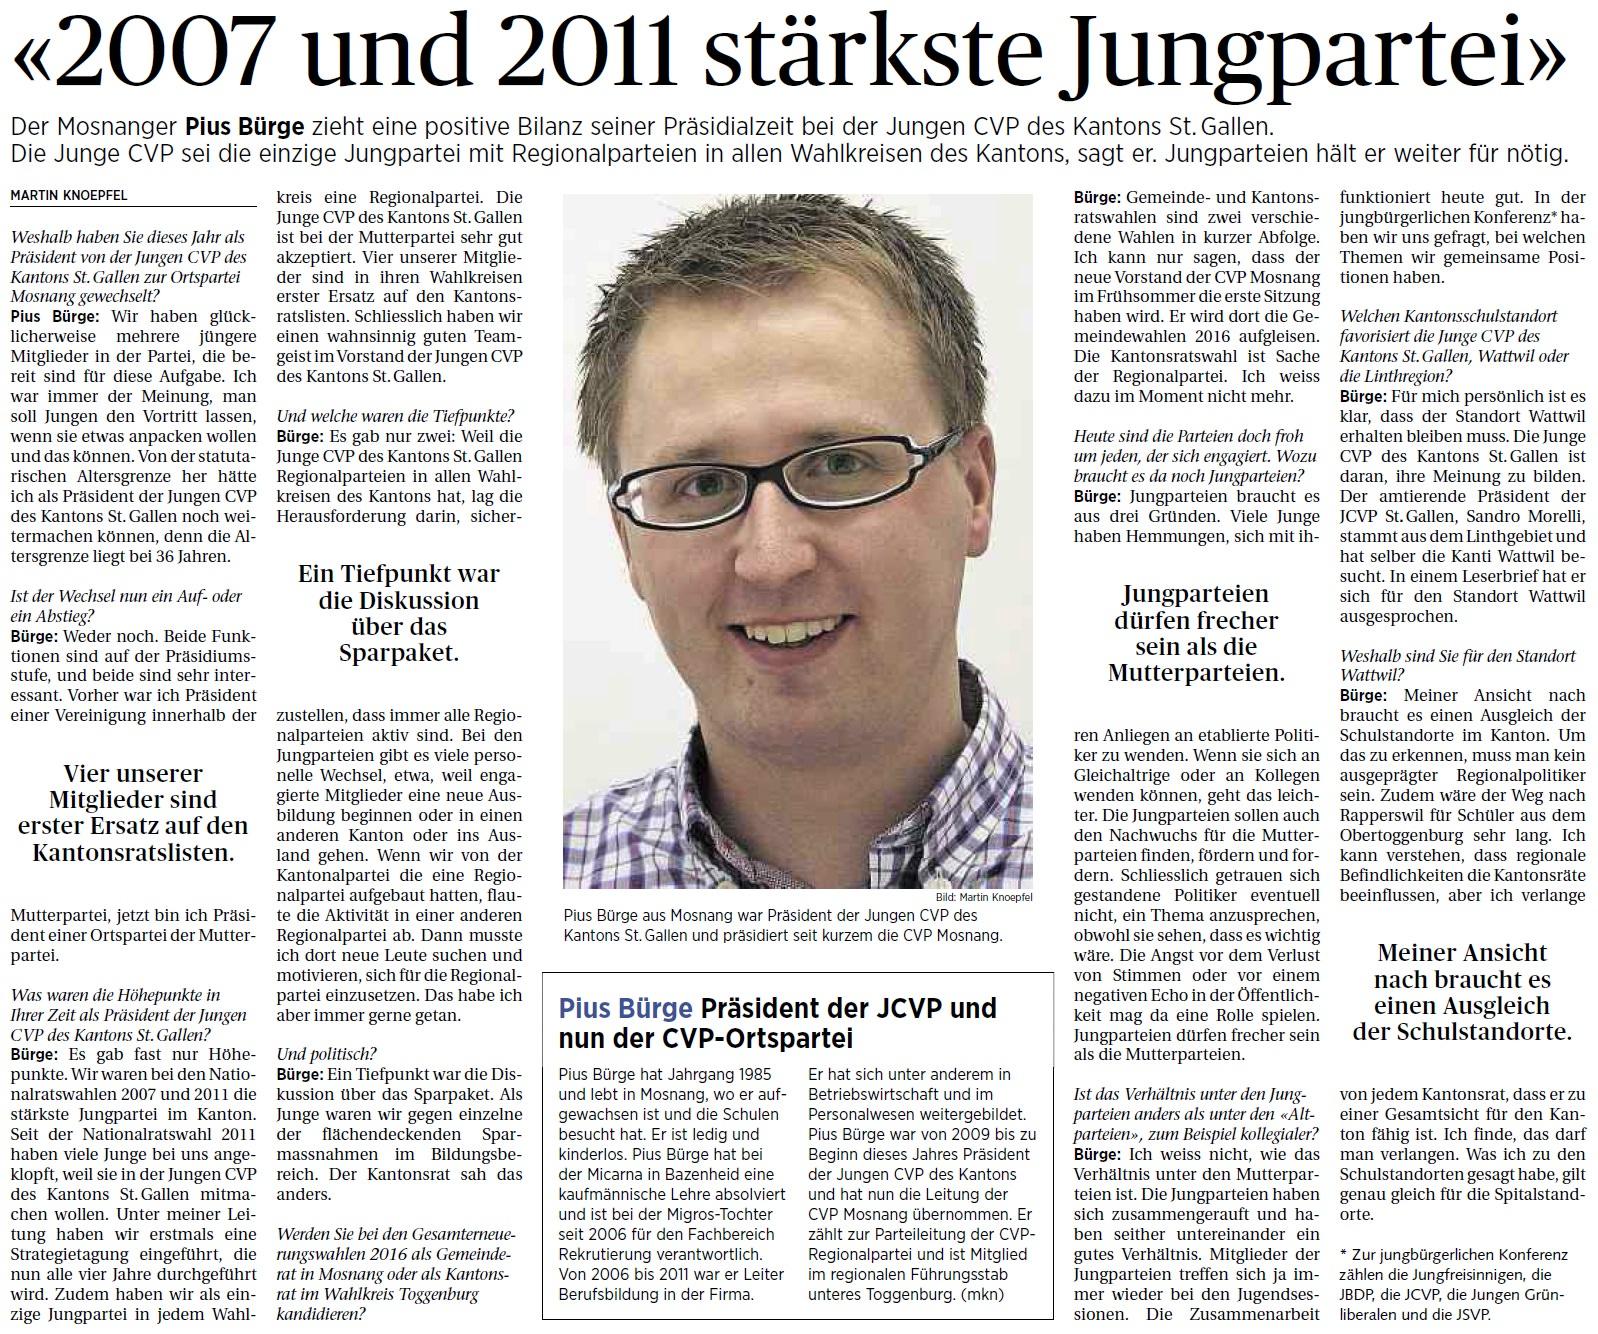 Interview mit Pius Bürge (Freitag, 14.03.2014)